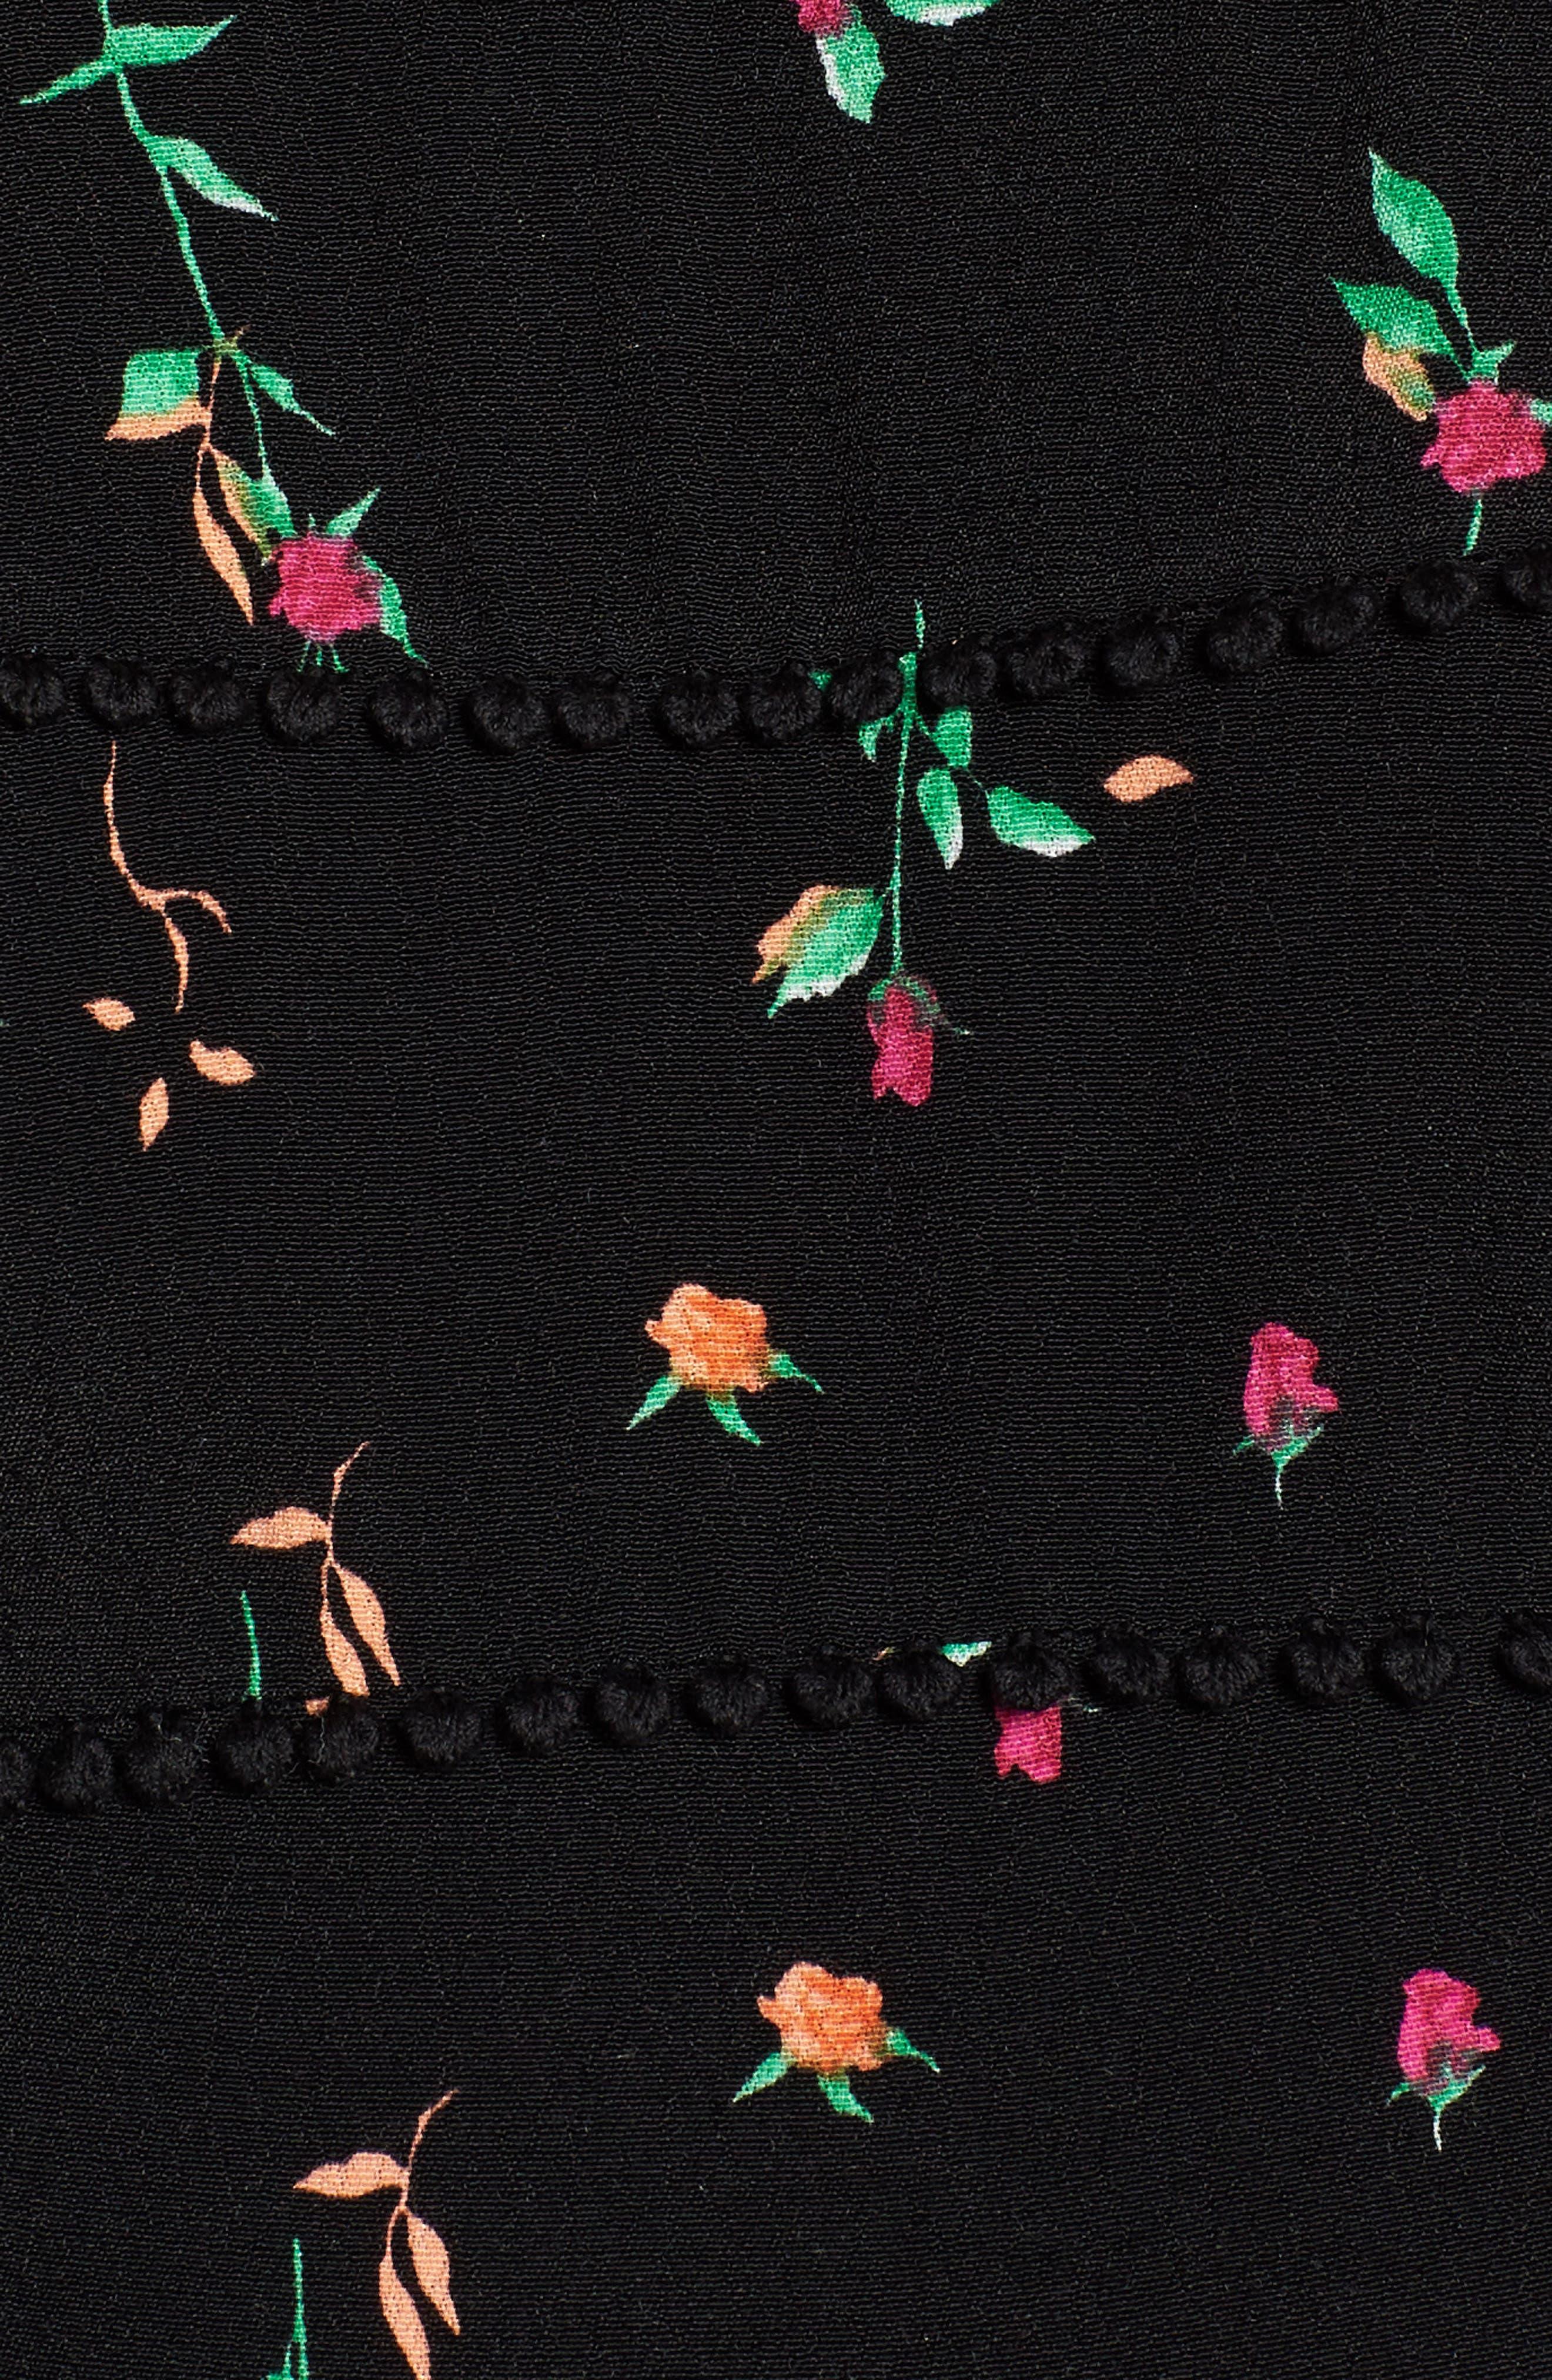 Blaze Off the Shoulder Crop Top,                             Alternate thumbnail 6, color,                             Noir Rose Ditsy